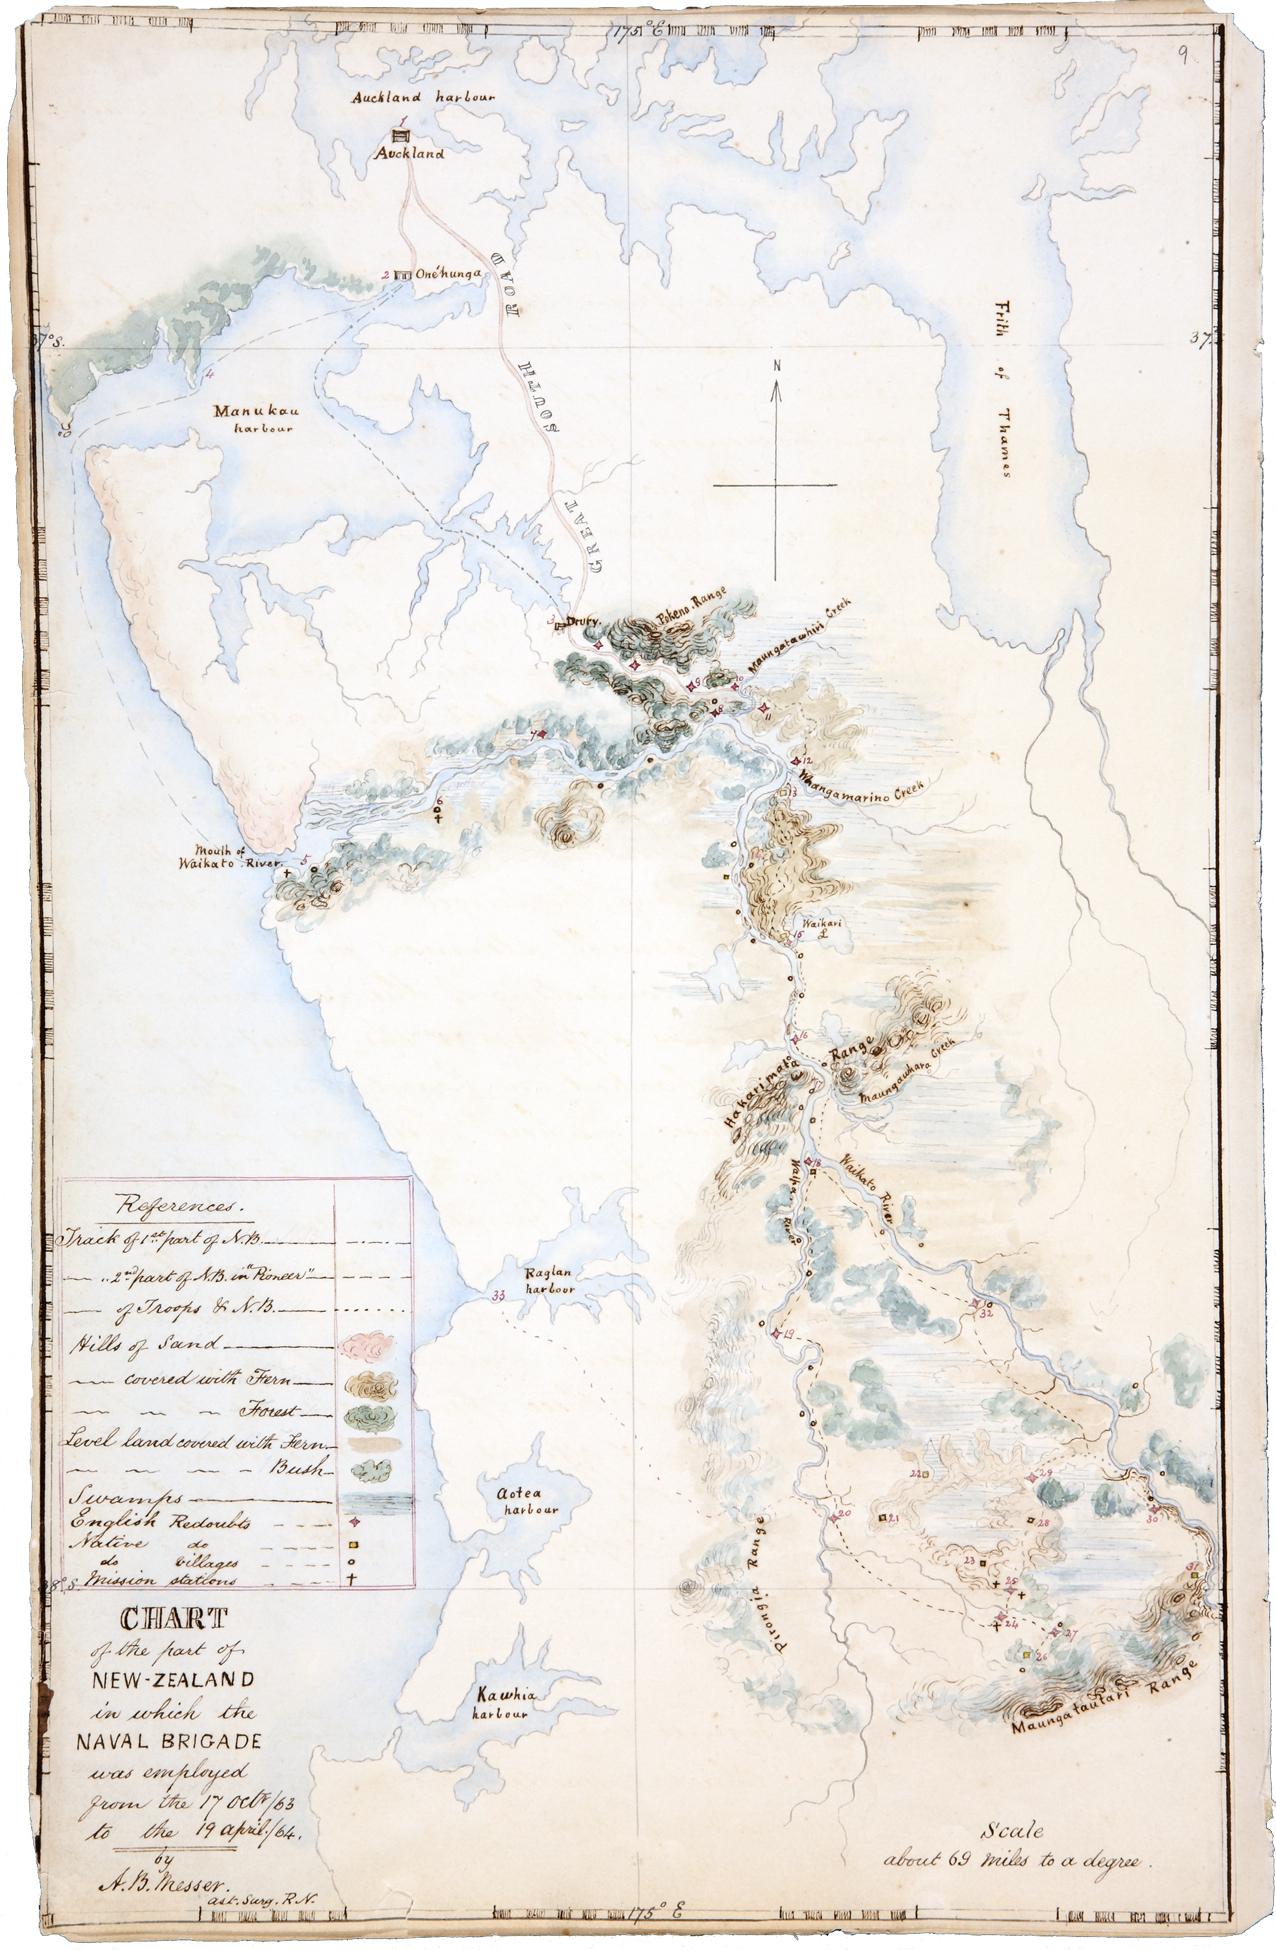 Medical Charting: Charting rebellious New Zealand.jpg - Wikimedia Commons,Chart